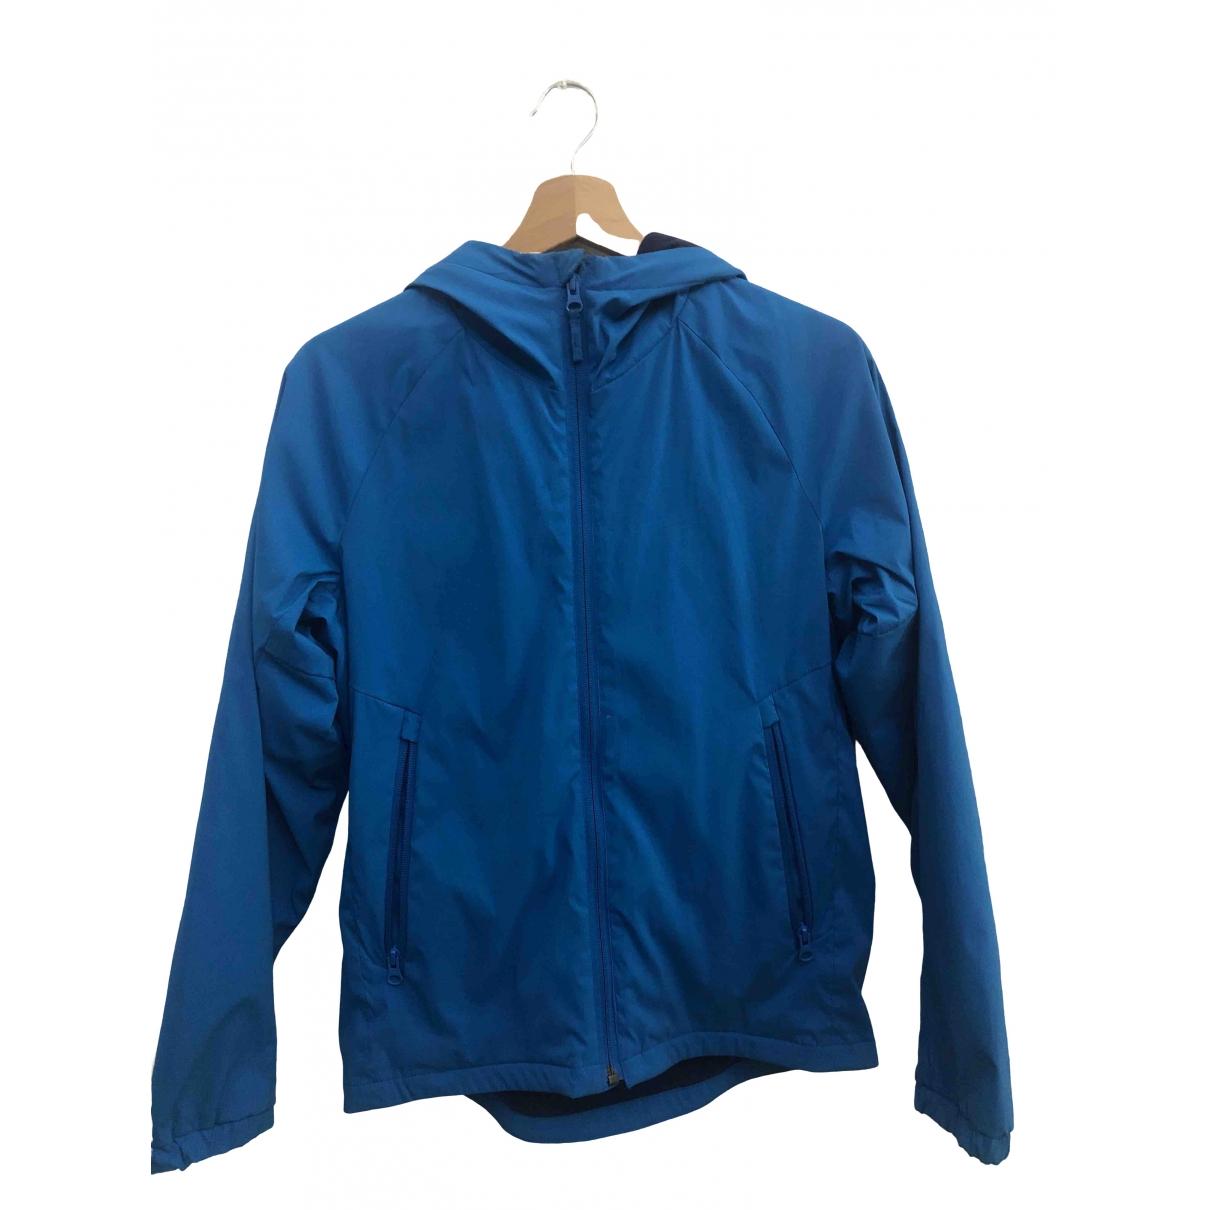 Uniqlo \N Blue jacket & coat for Kids 14 years - S UK